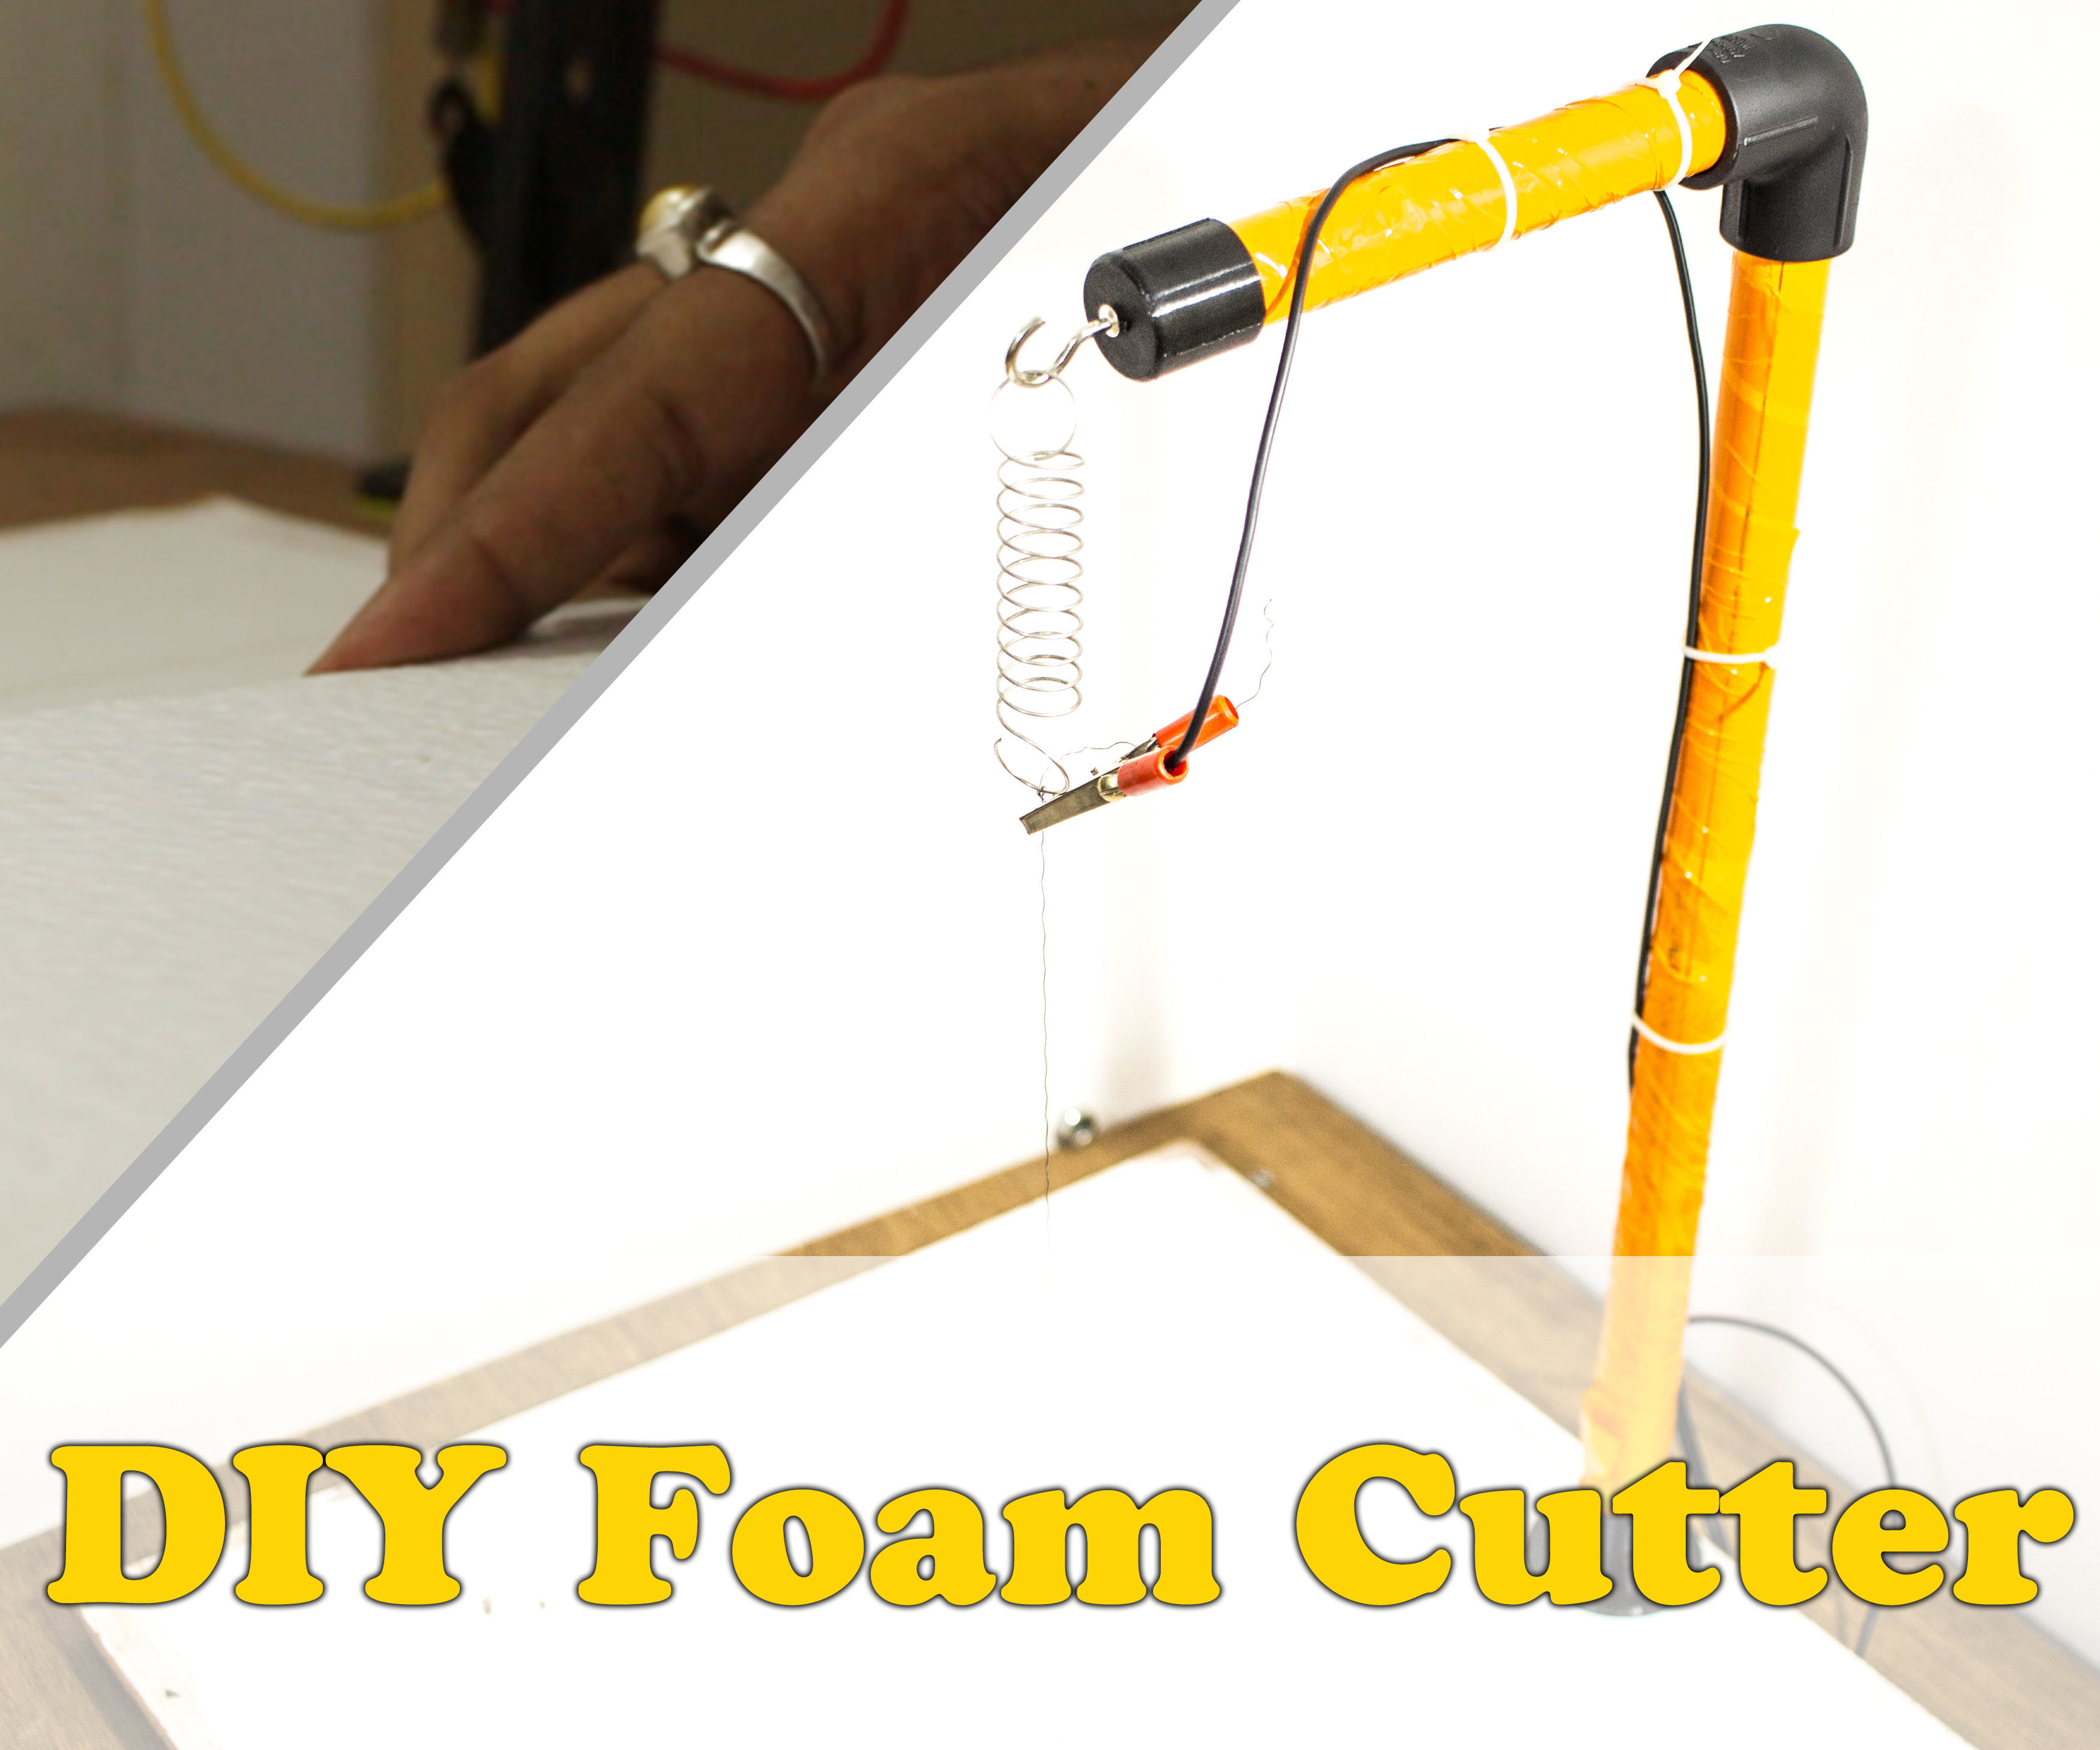 $5 DIY Hot Wire Styrofoam Cutter